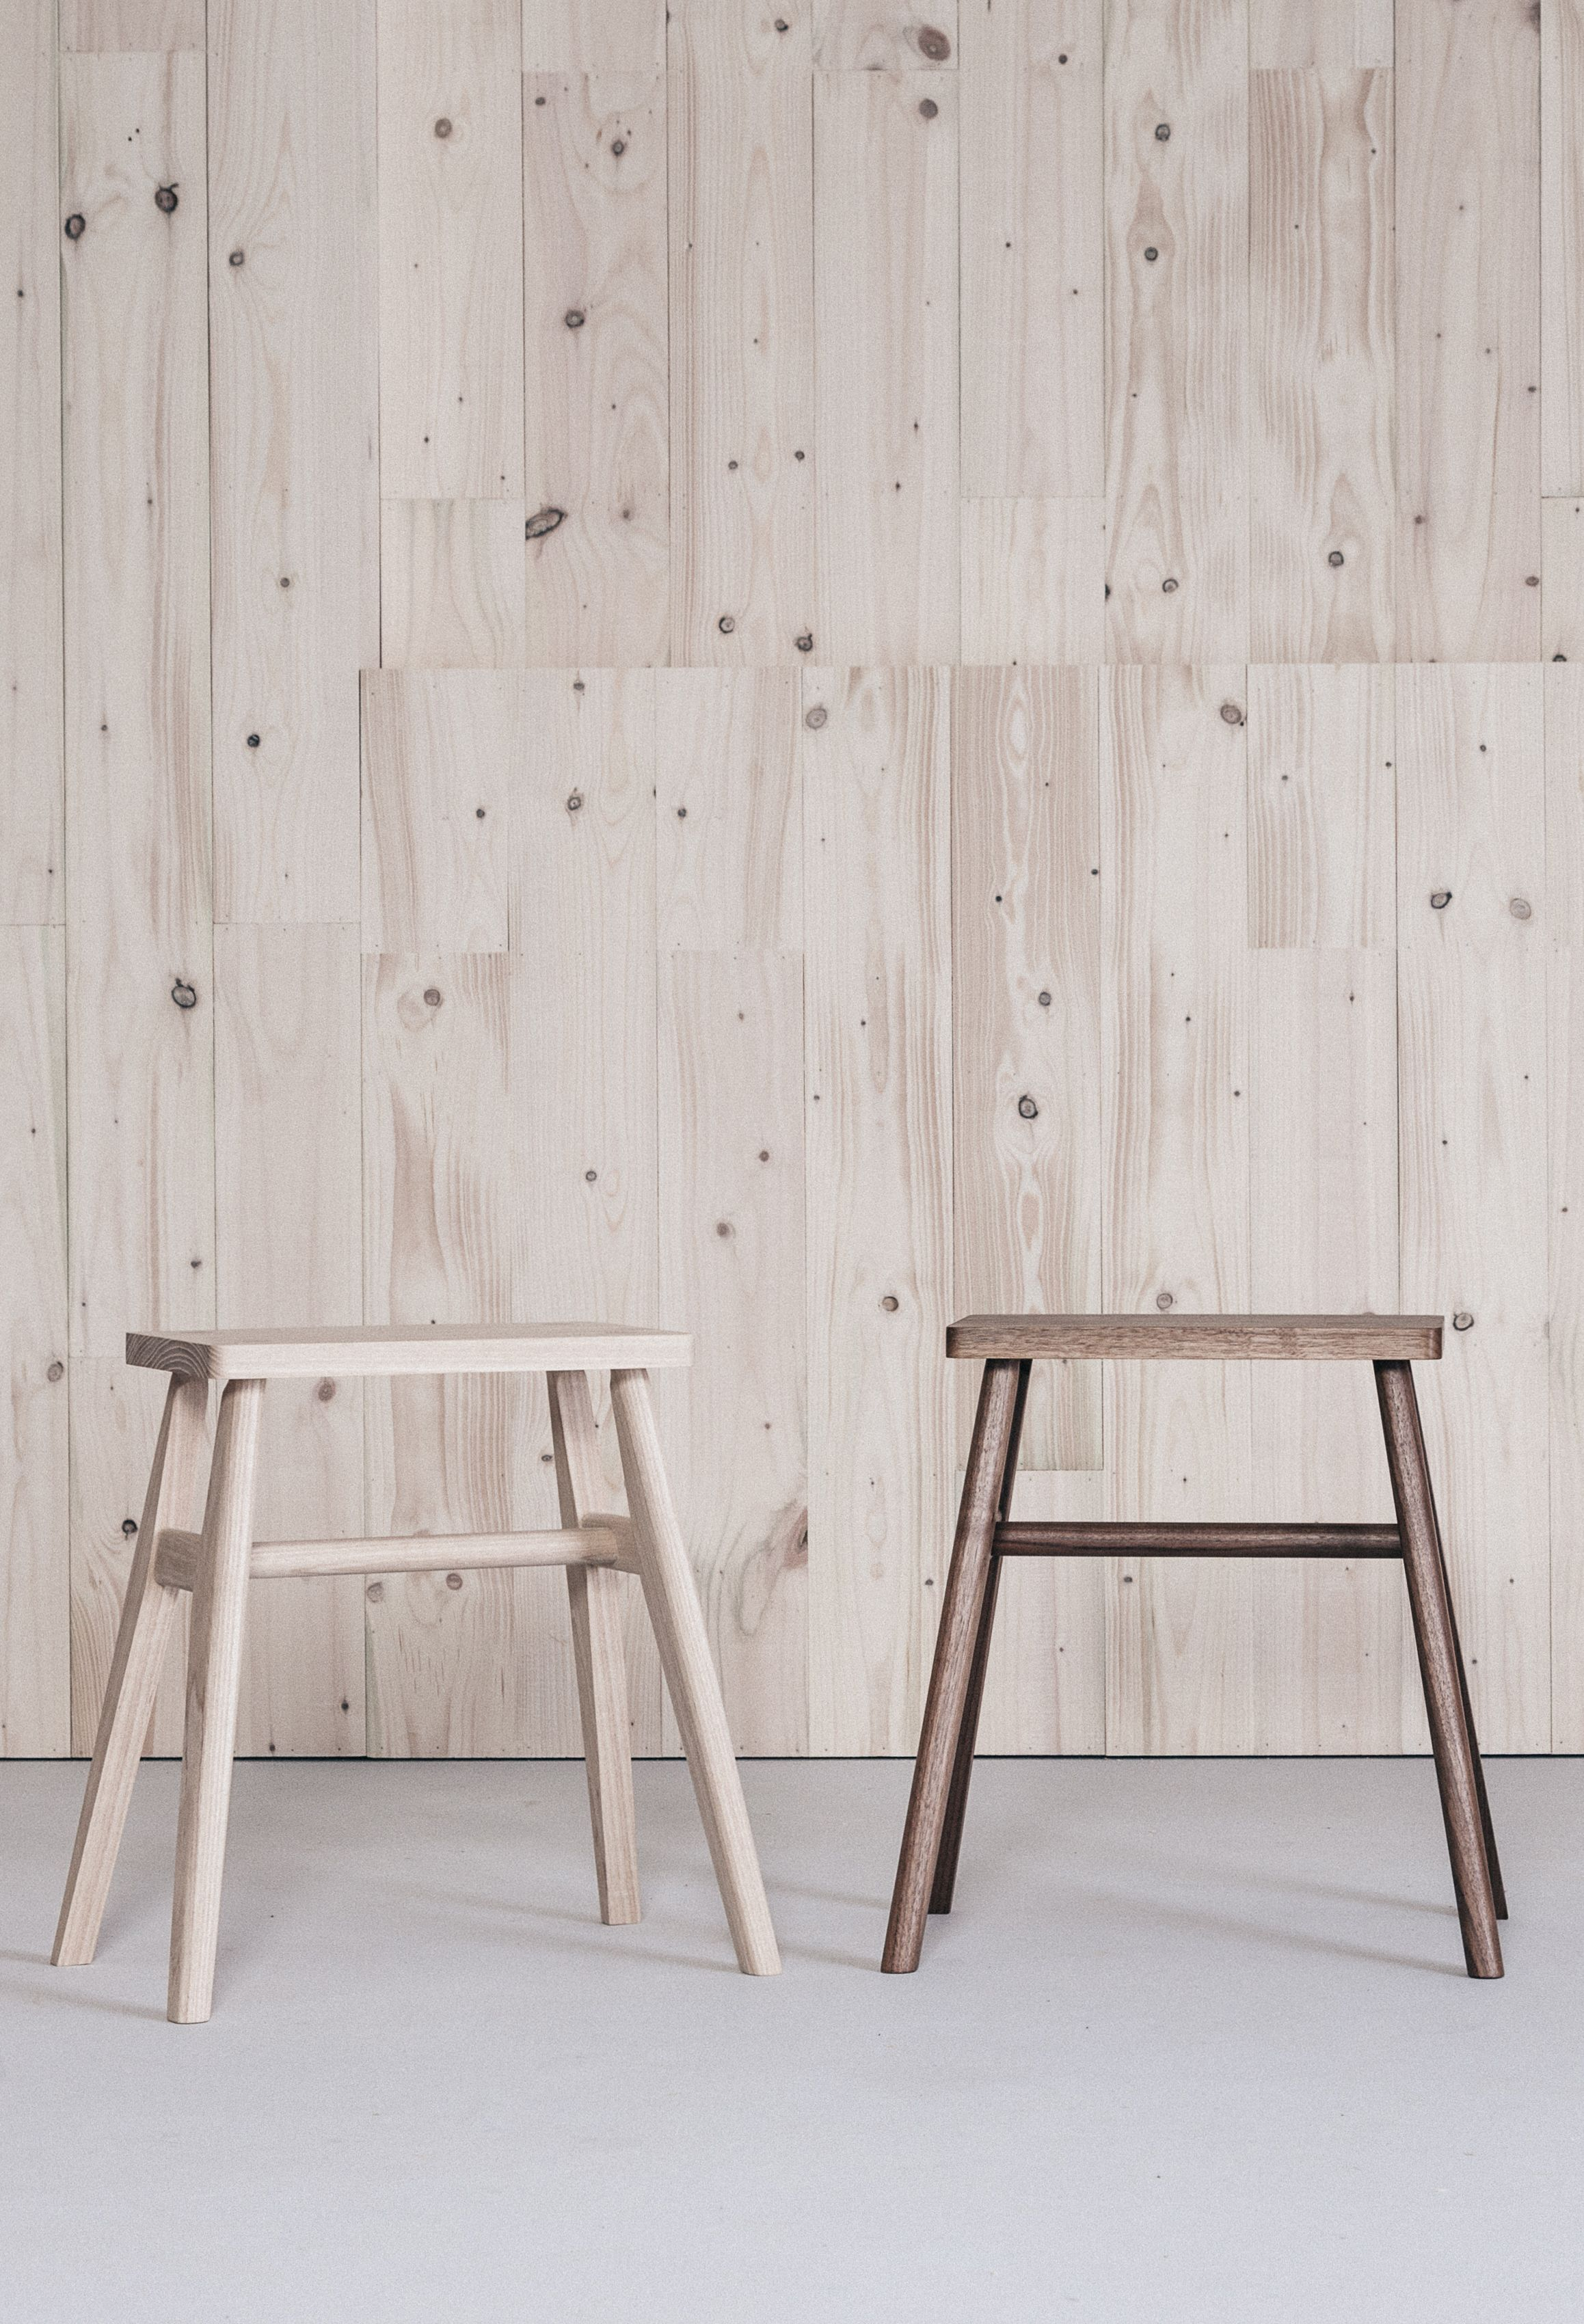 Stool From Splinter Designs Furniture Design (傢俱設計